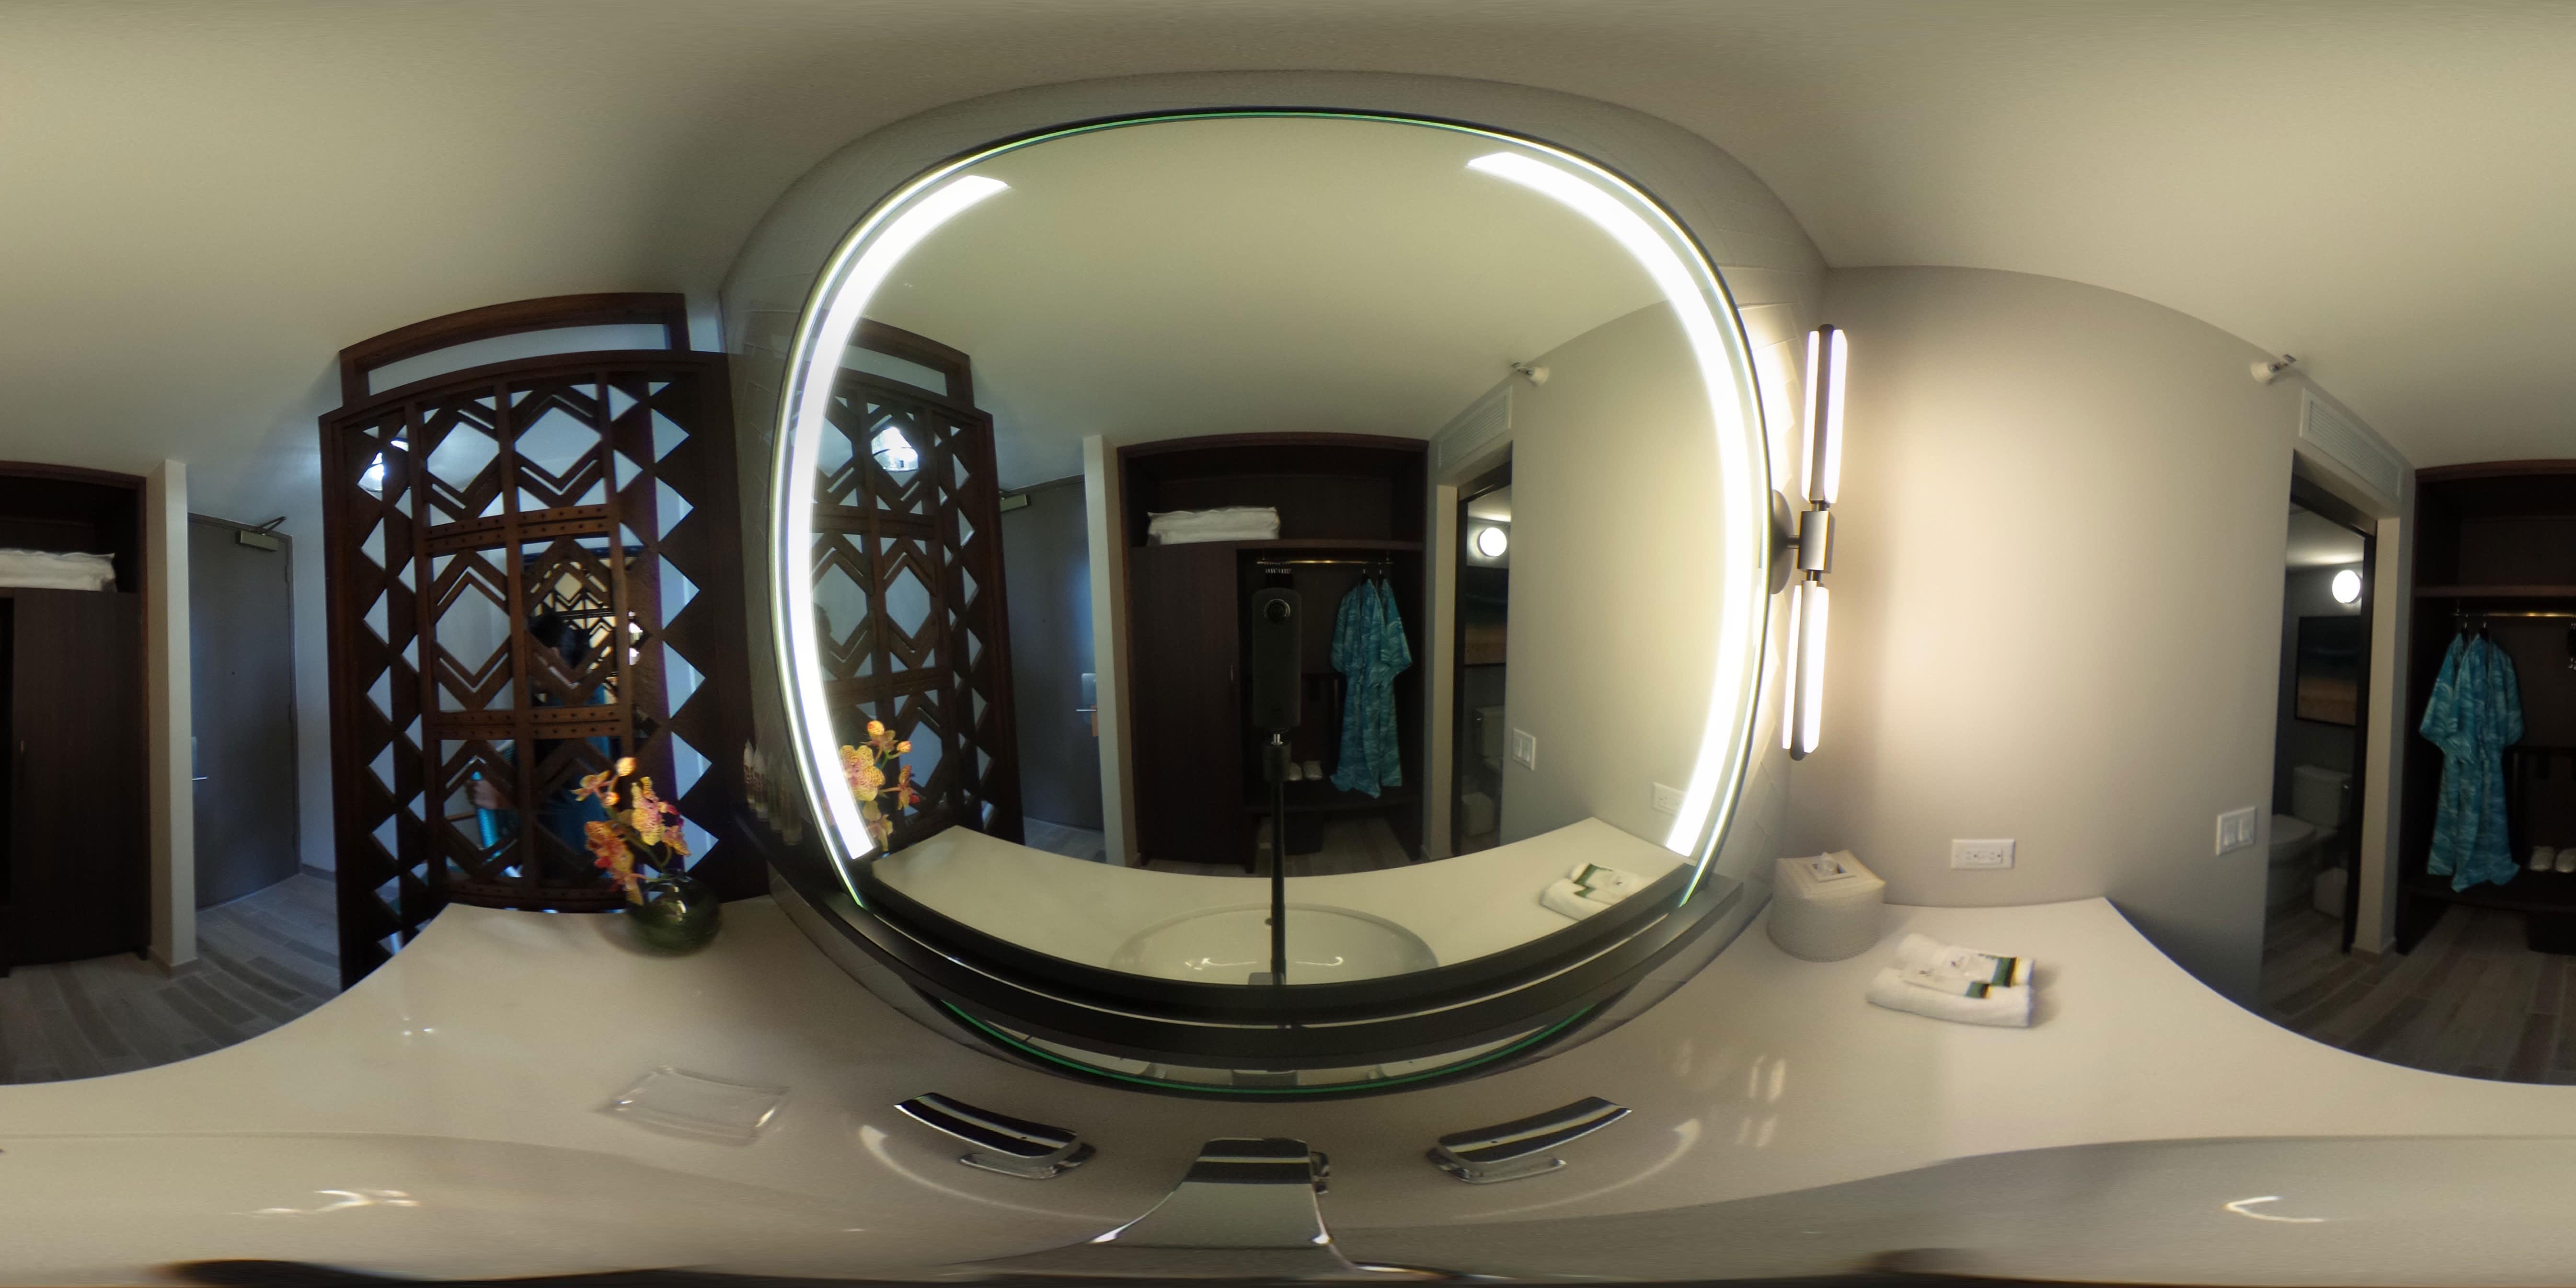 Waikiki Beachcomber by Outrigger Bathroom Mirror